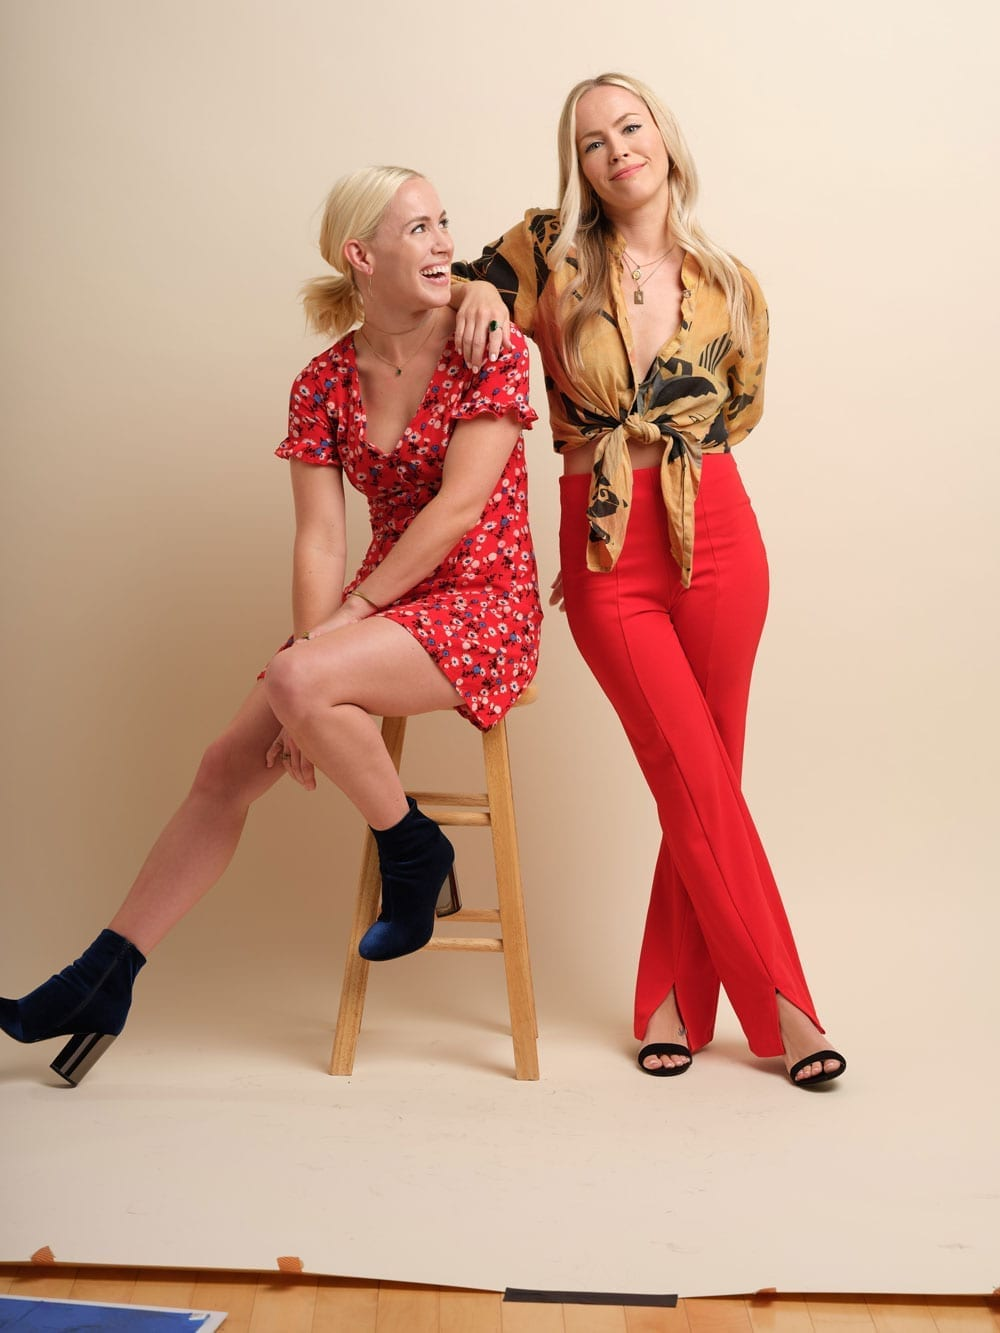 Celebrating Sisters: The Hood Sisters of Hoodzpah